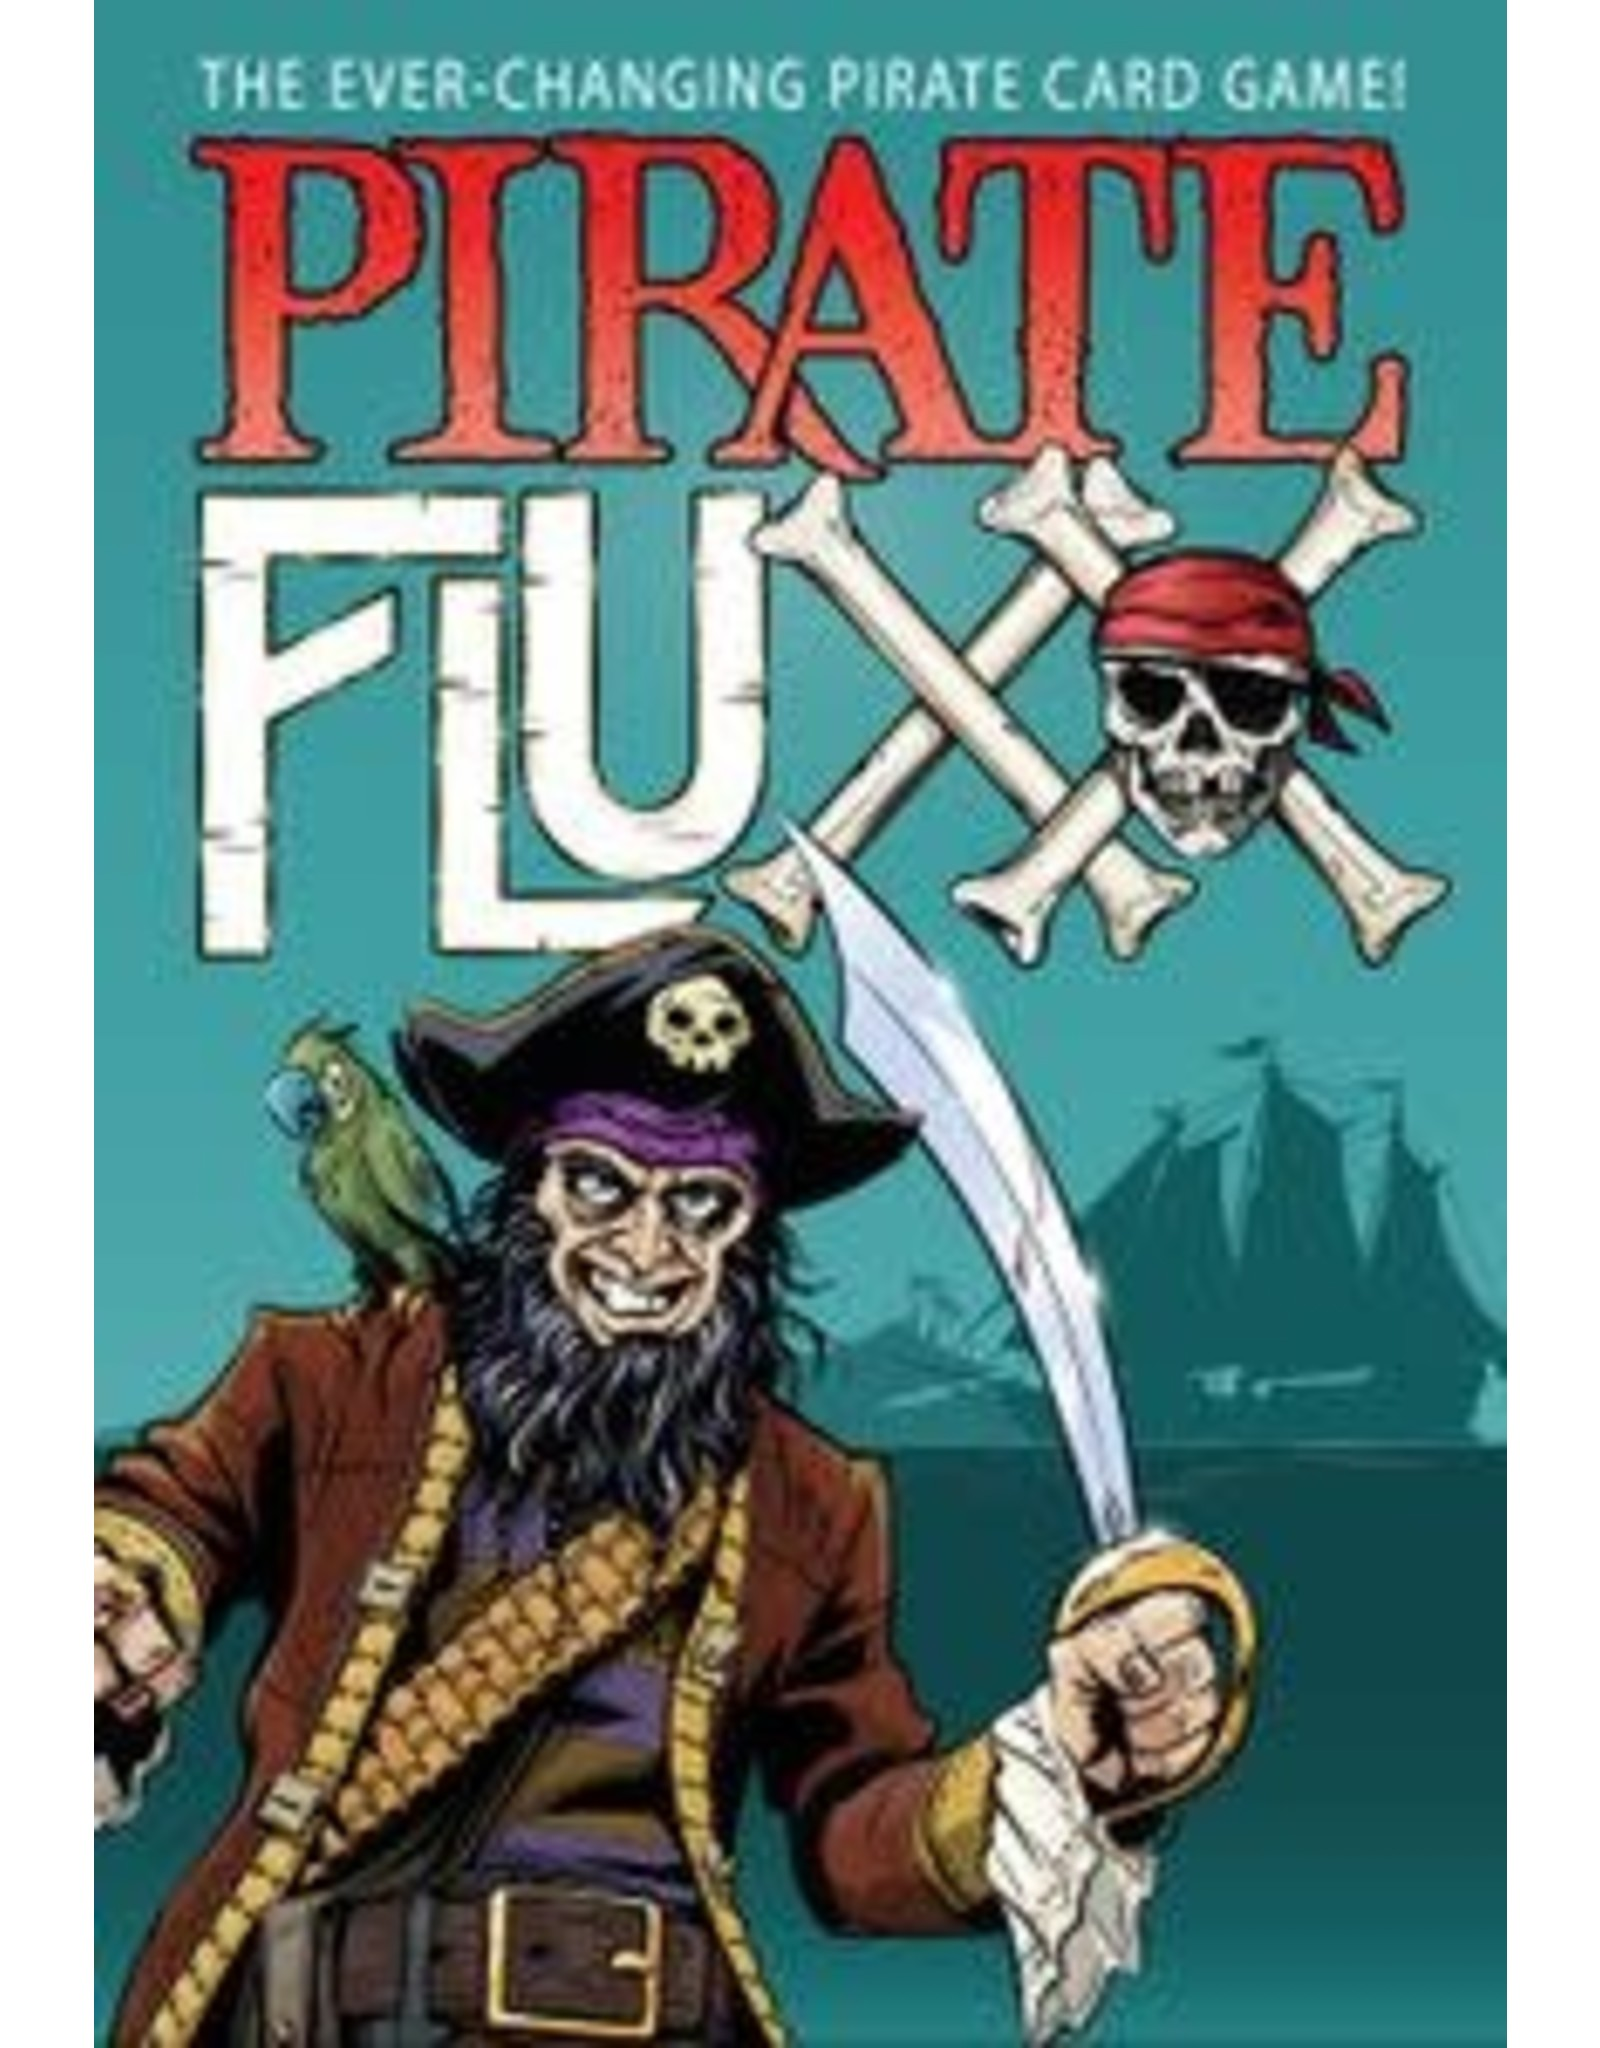 Pirate Fluxx Board Game